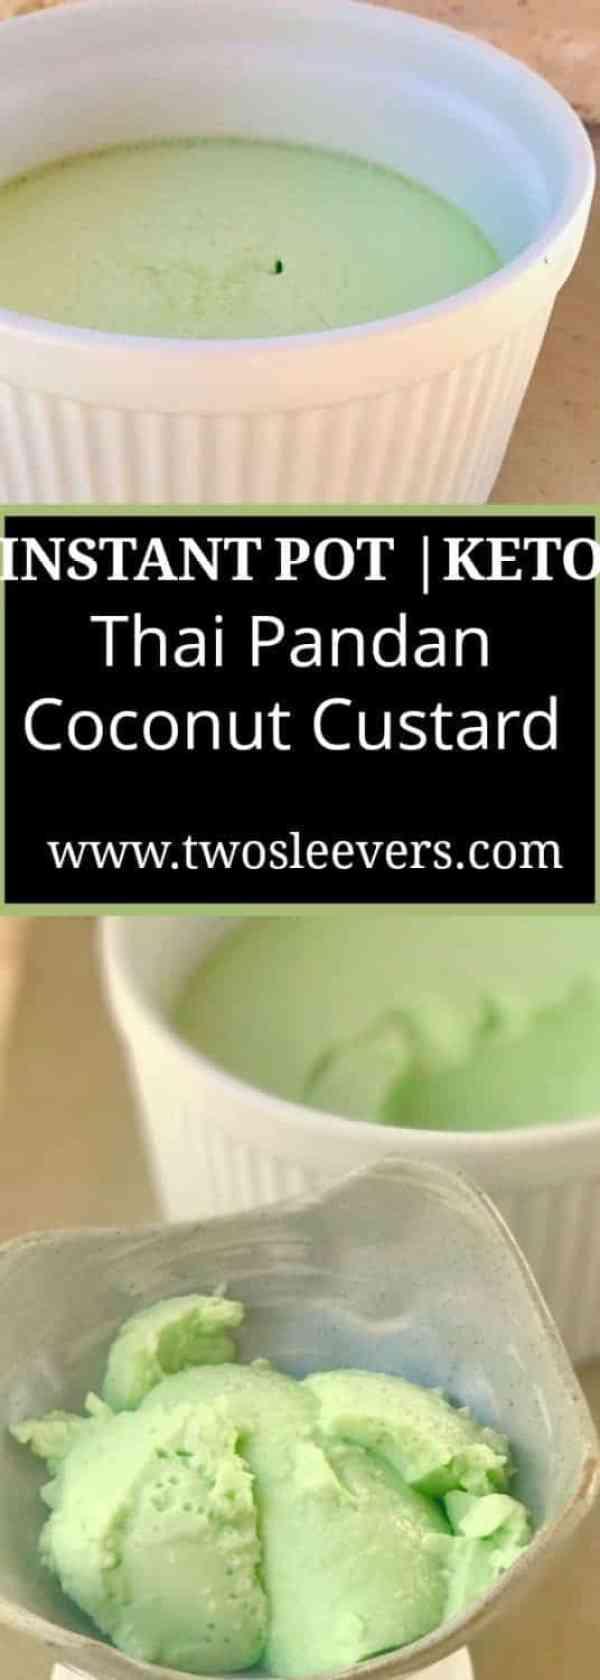 pandan pinterest black and white - Instant Pot Keto Thai Coconut Pandan Custard - https://twosleevers.com